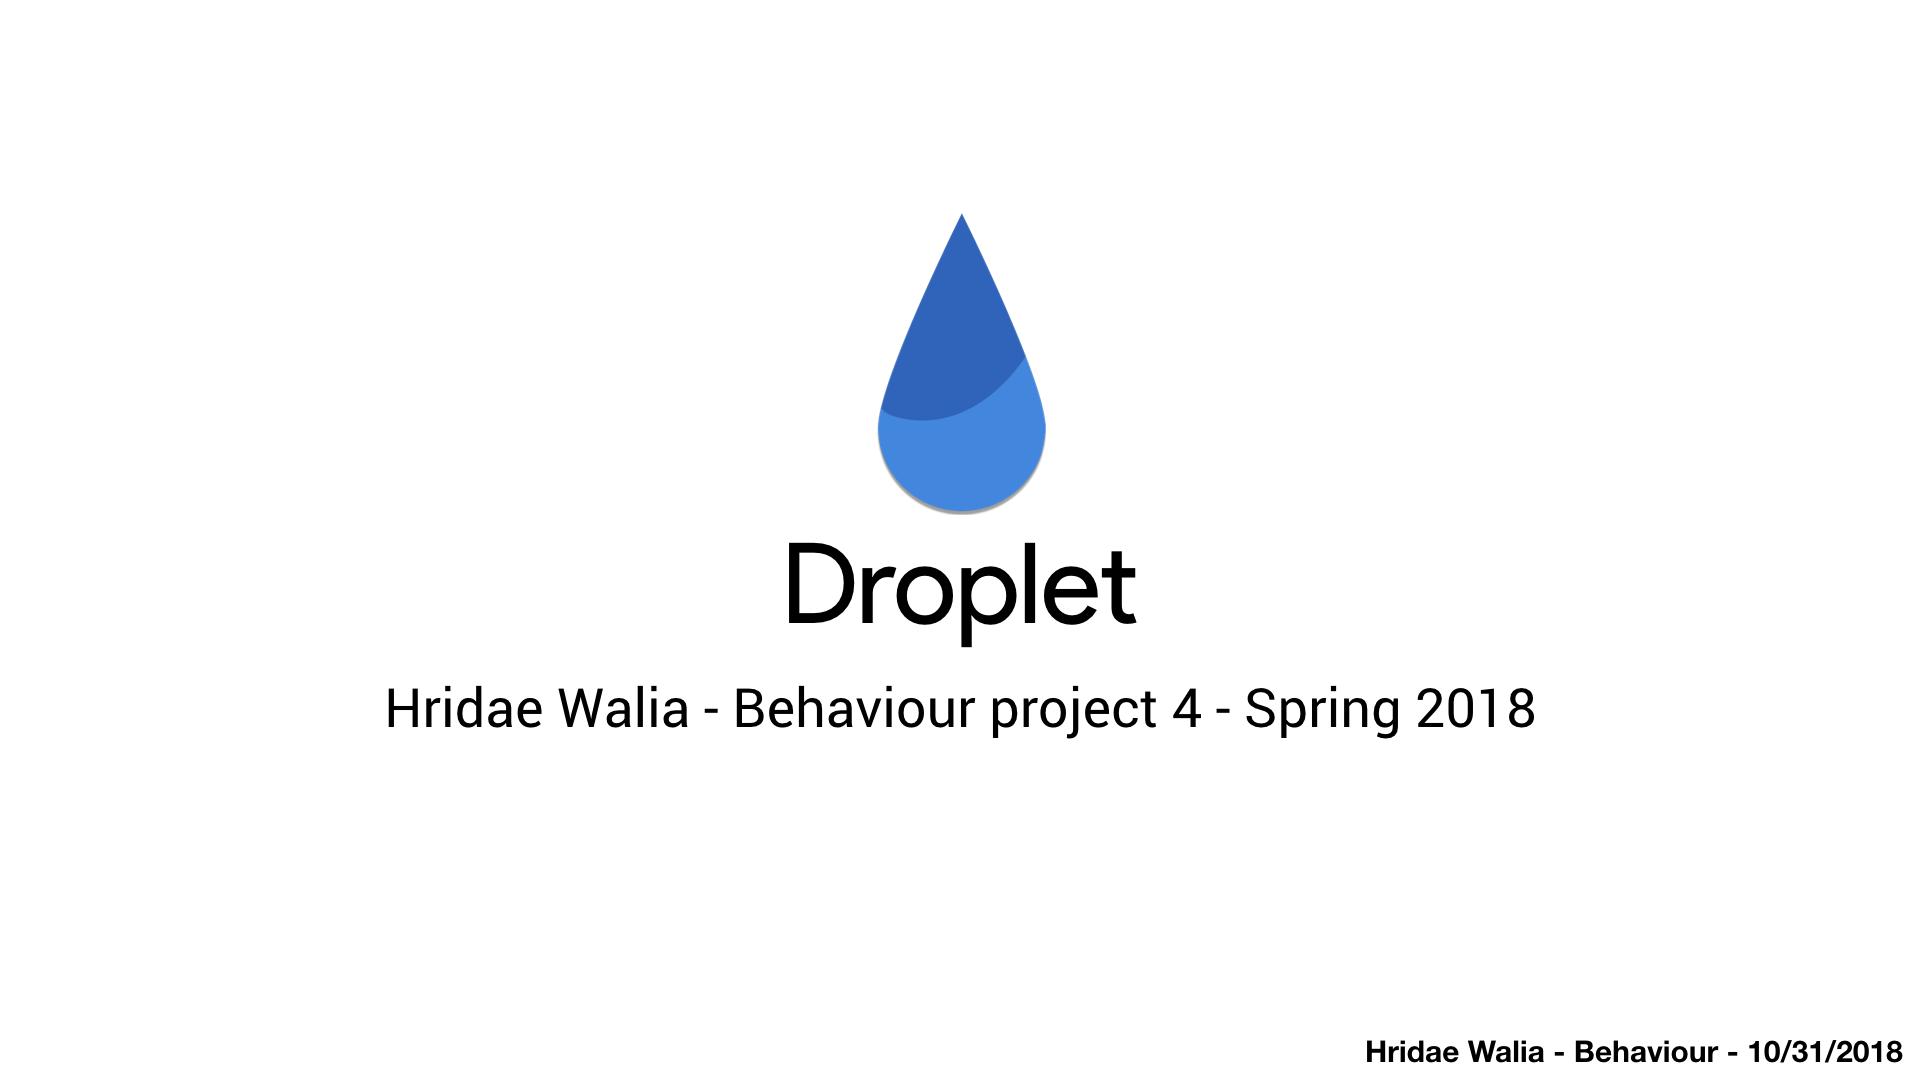 Droplet images.001